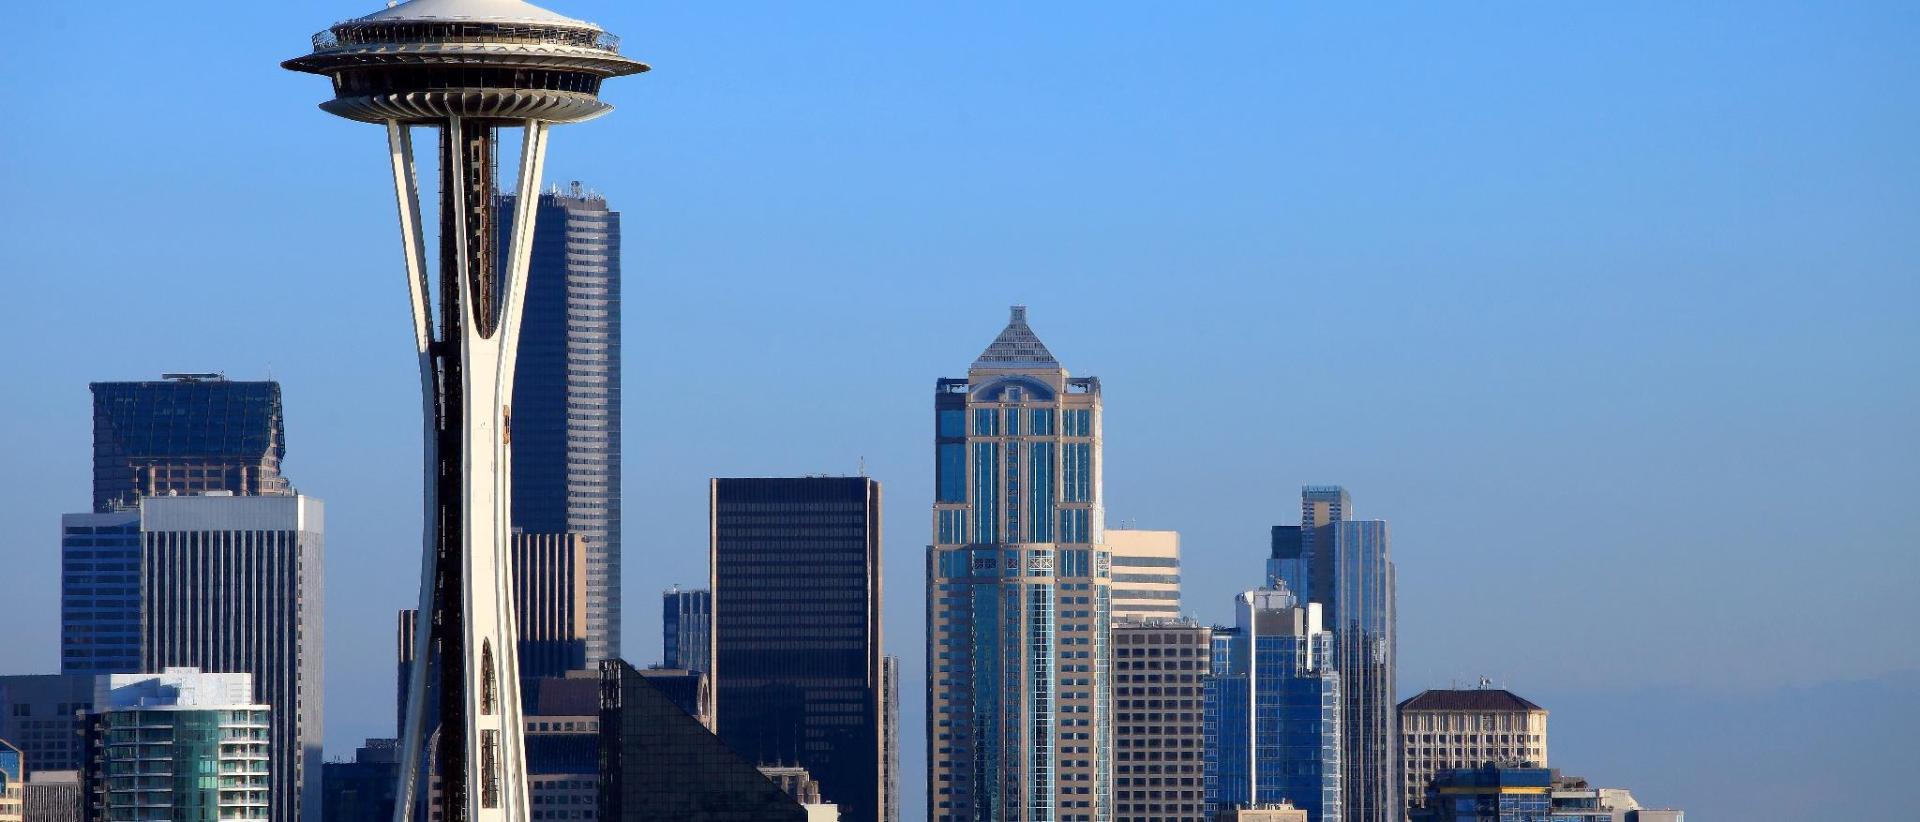 Hotels near Seattle-Tacoma International Airport, Seattle (WA) - BEST HOTEL  RATES Near Airports, Seattle (WA) - United States